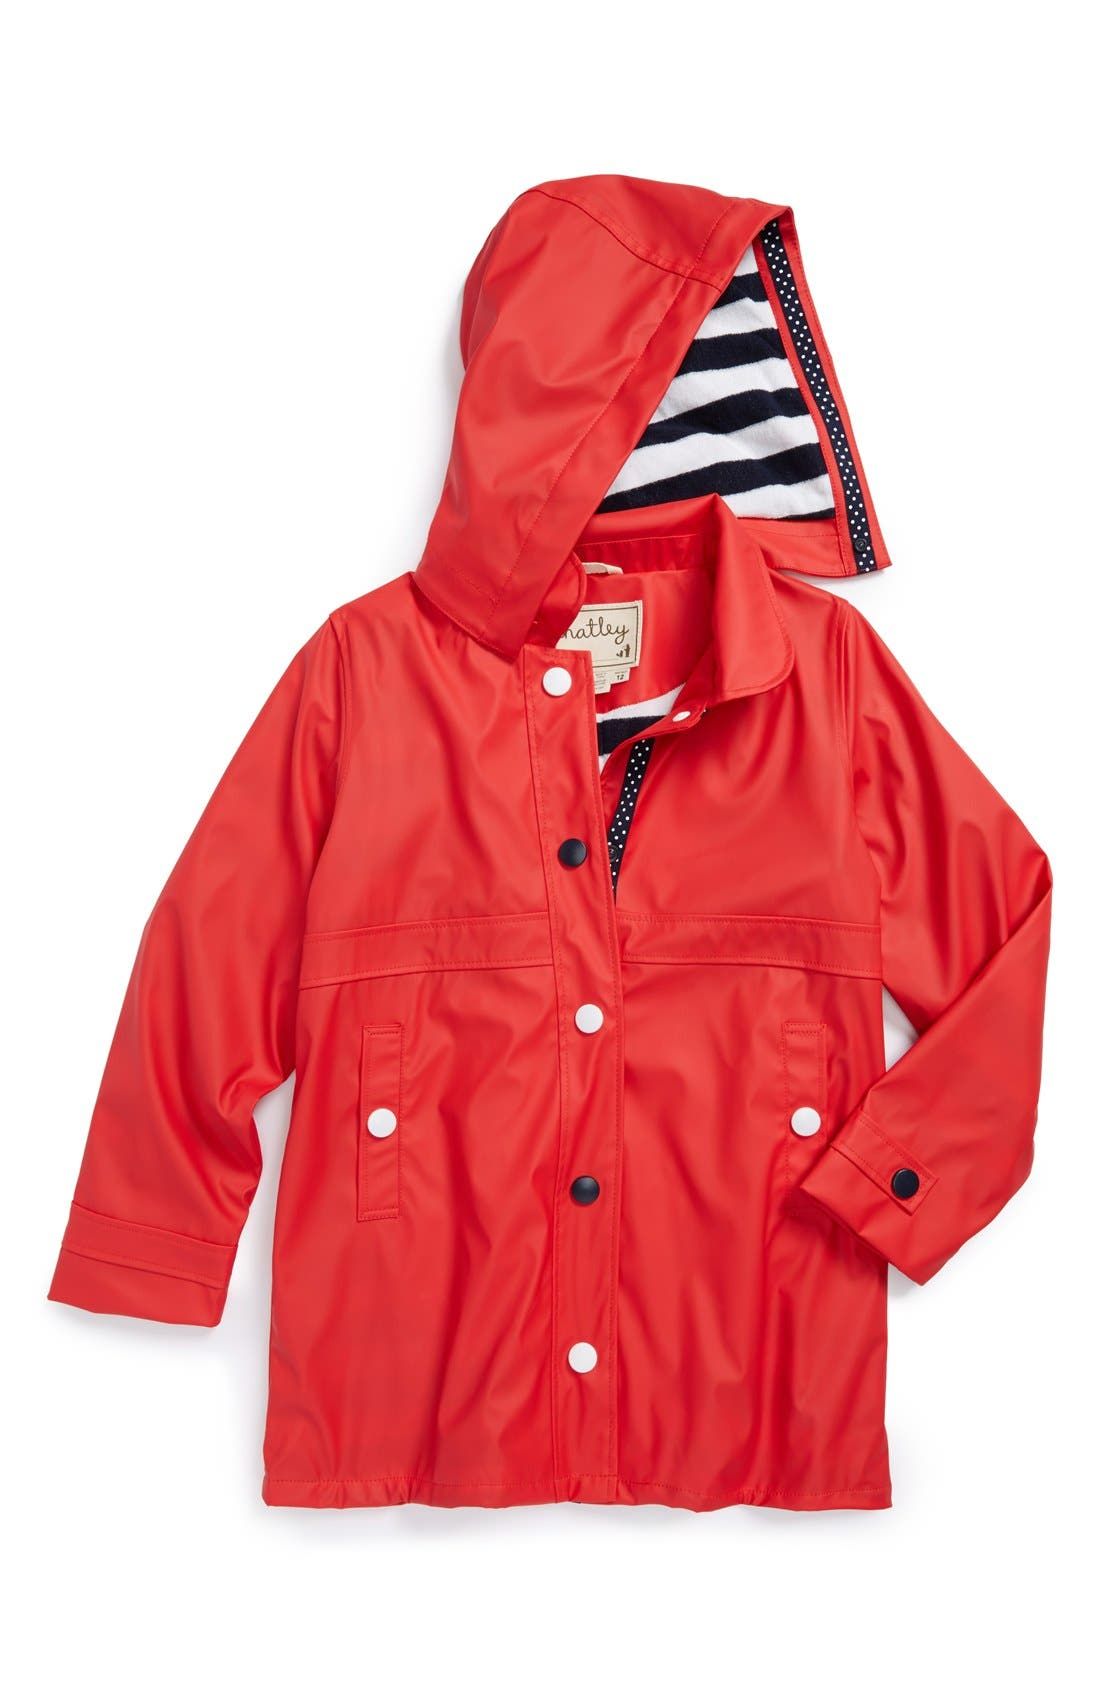 Main Image - Hatley 'Splash' Terry Lined Waterproof Rain Jacket (Toddler Girls, Little Girls & Big Girls)